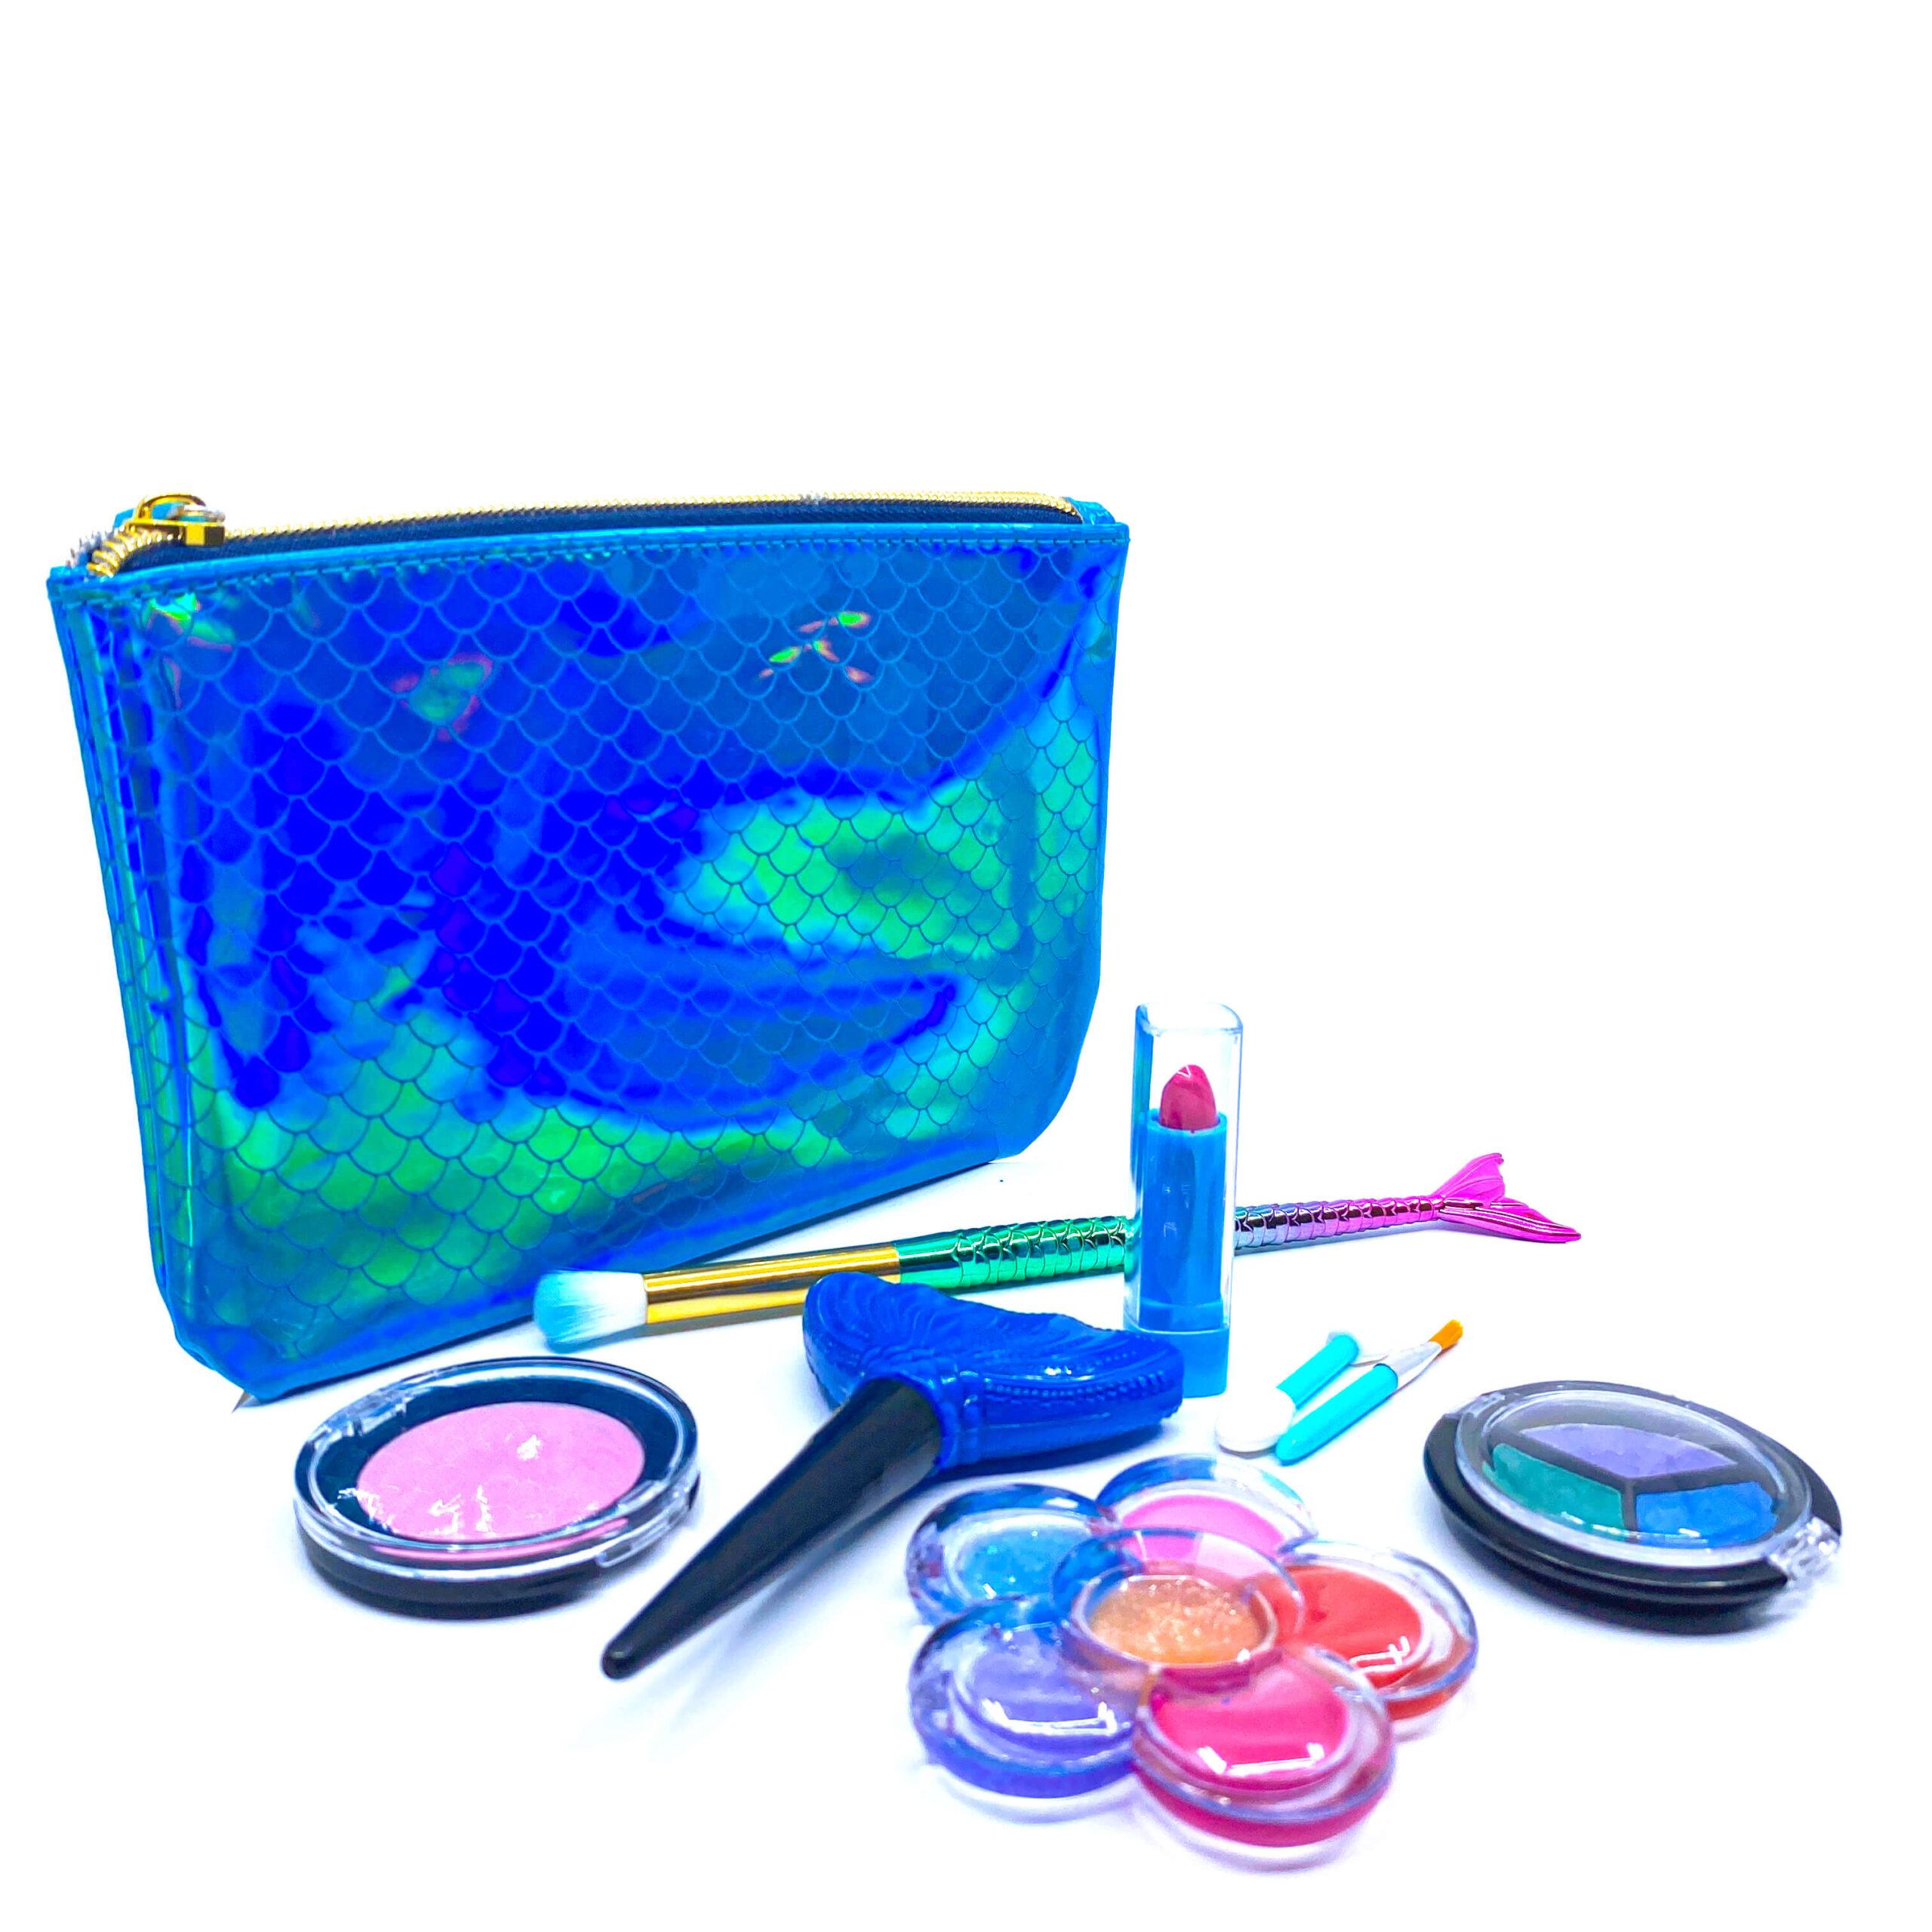 Niutoys-Juguete-maquillaje-sirena-3